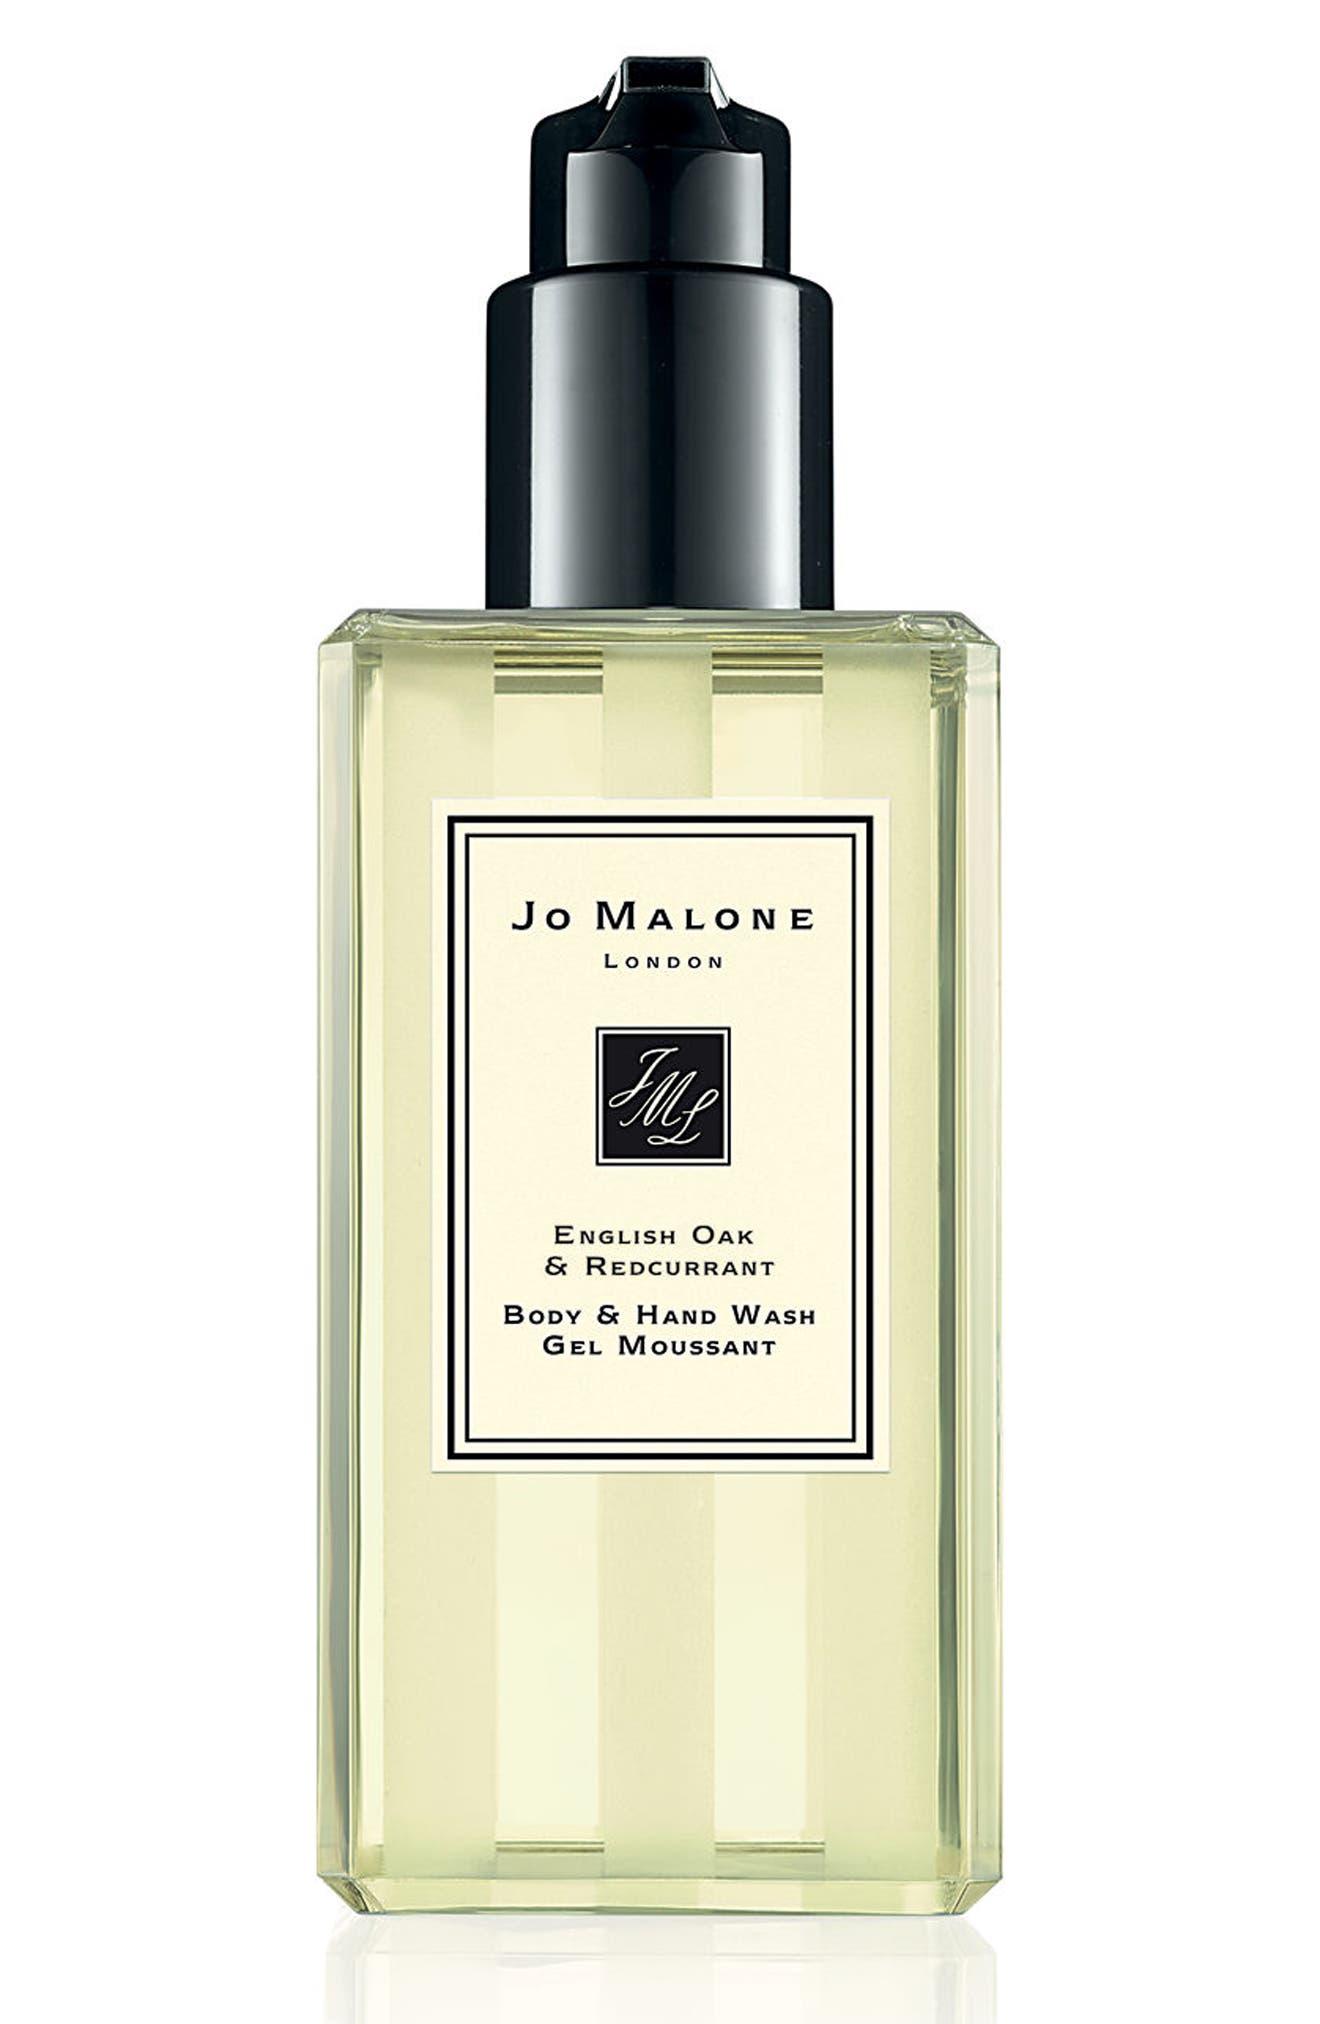 Jo Malone London™ English Oak & Redcurrant Body & Hand Wash